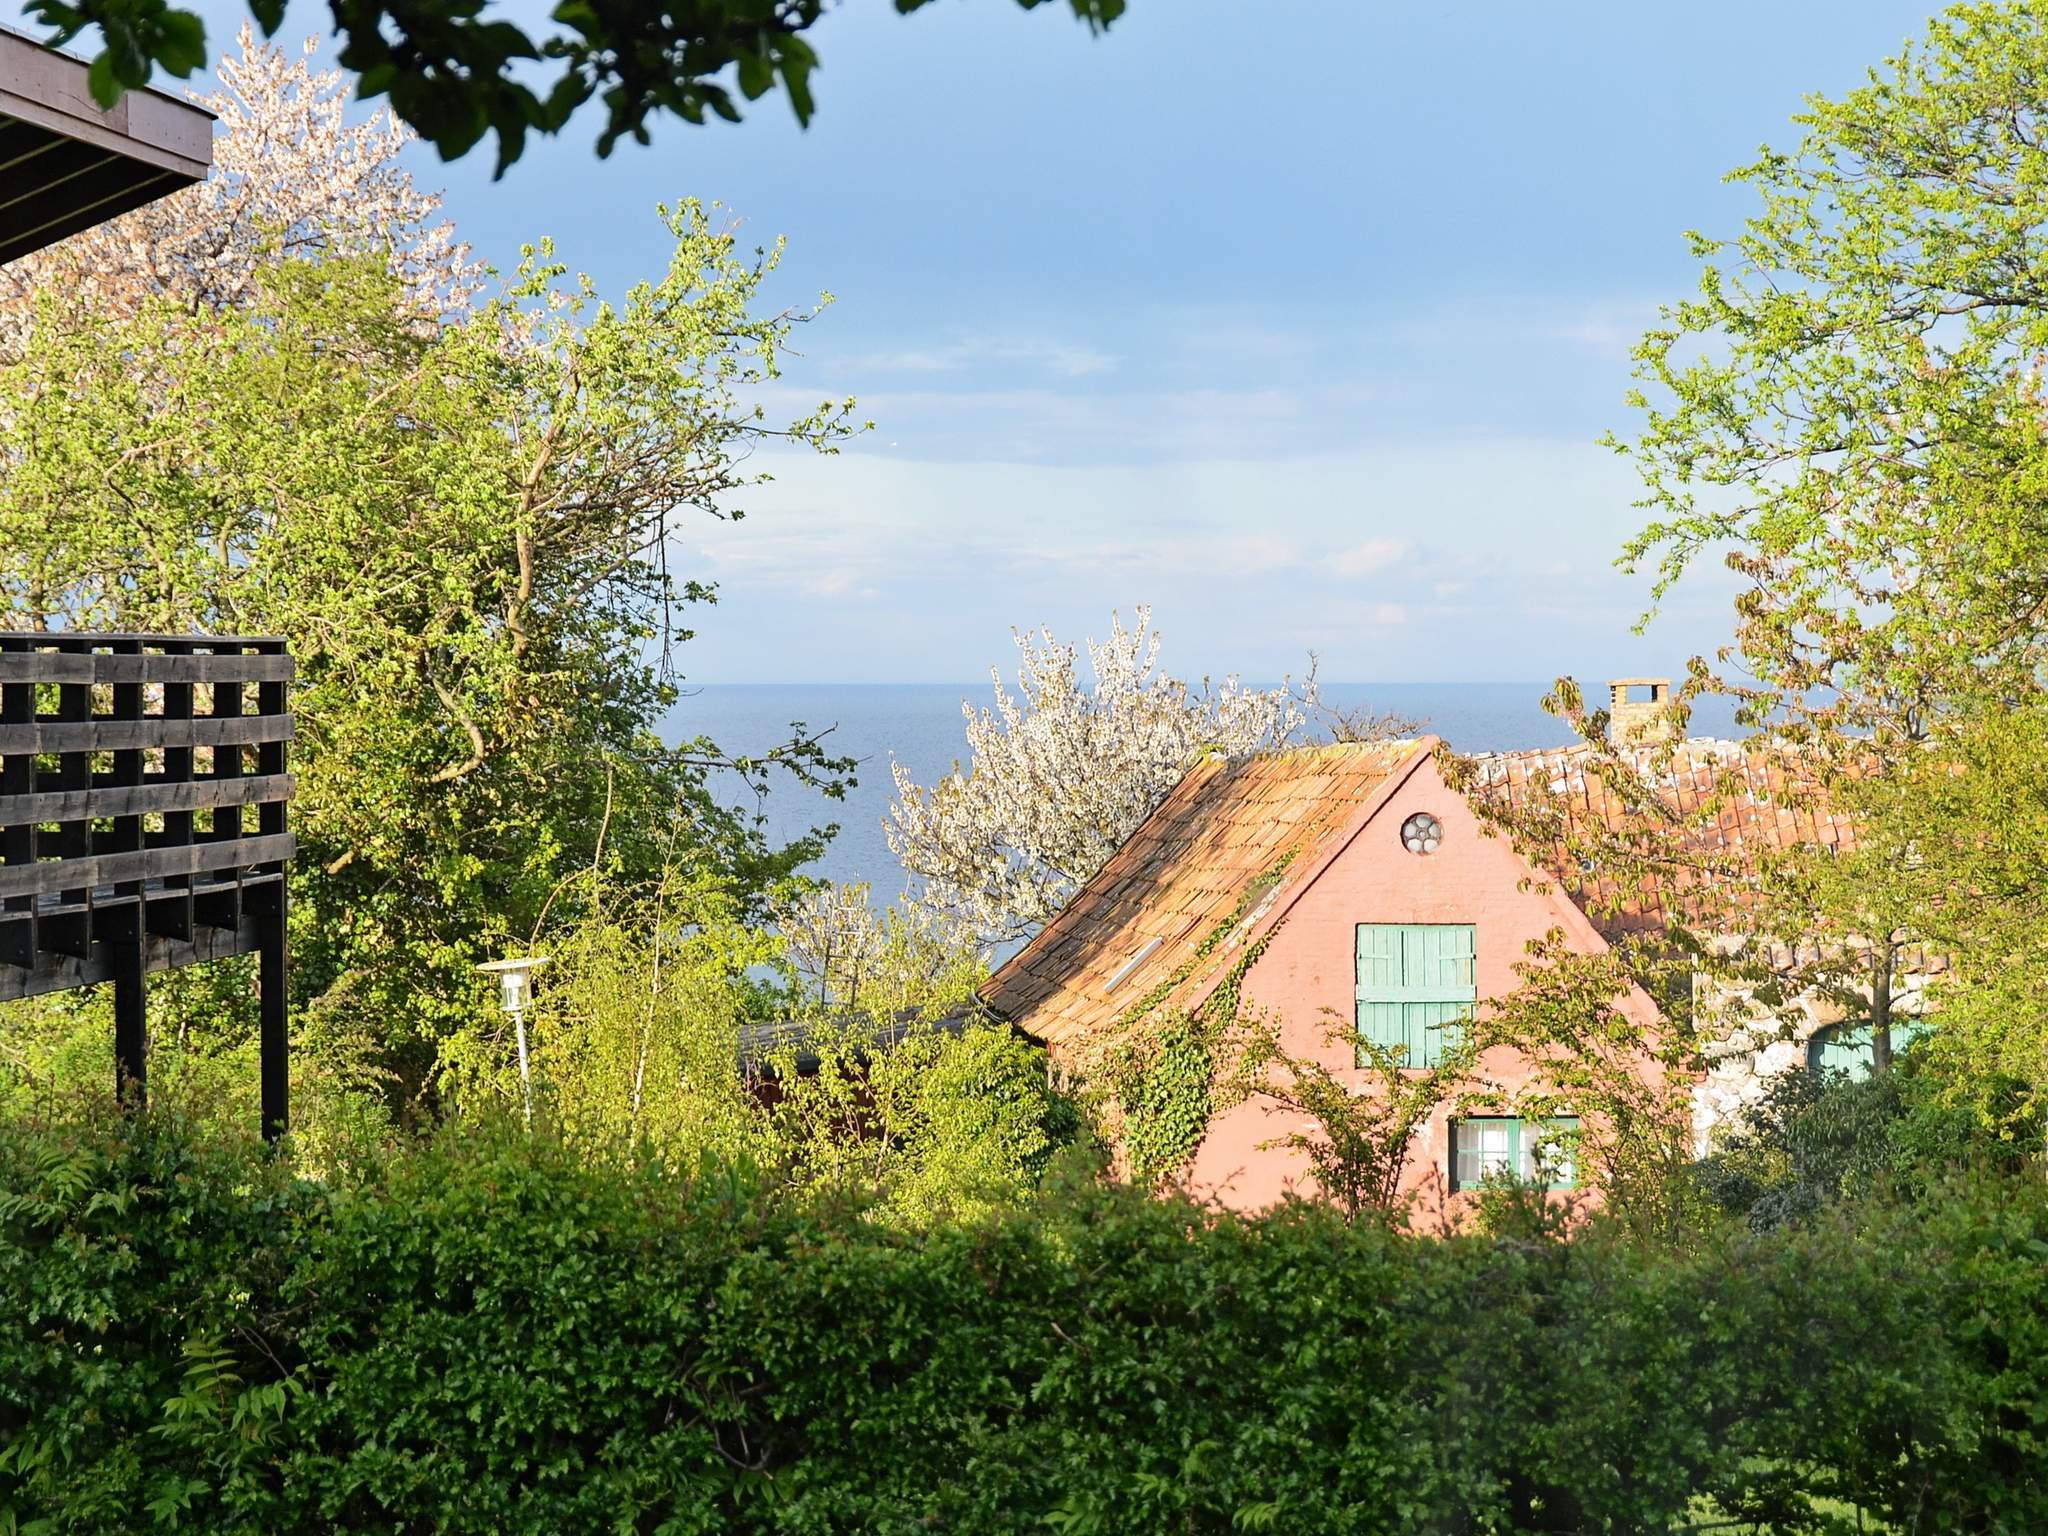 Ferienhaus Allinge (86994), Allinge, , Bornholm, Dänemark, Bild 20